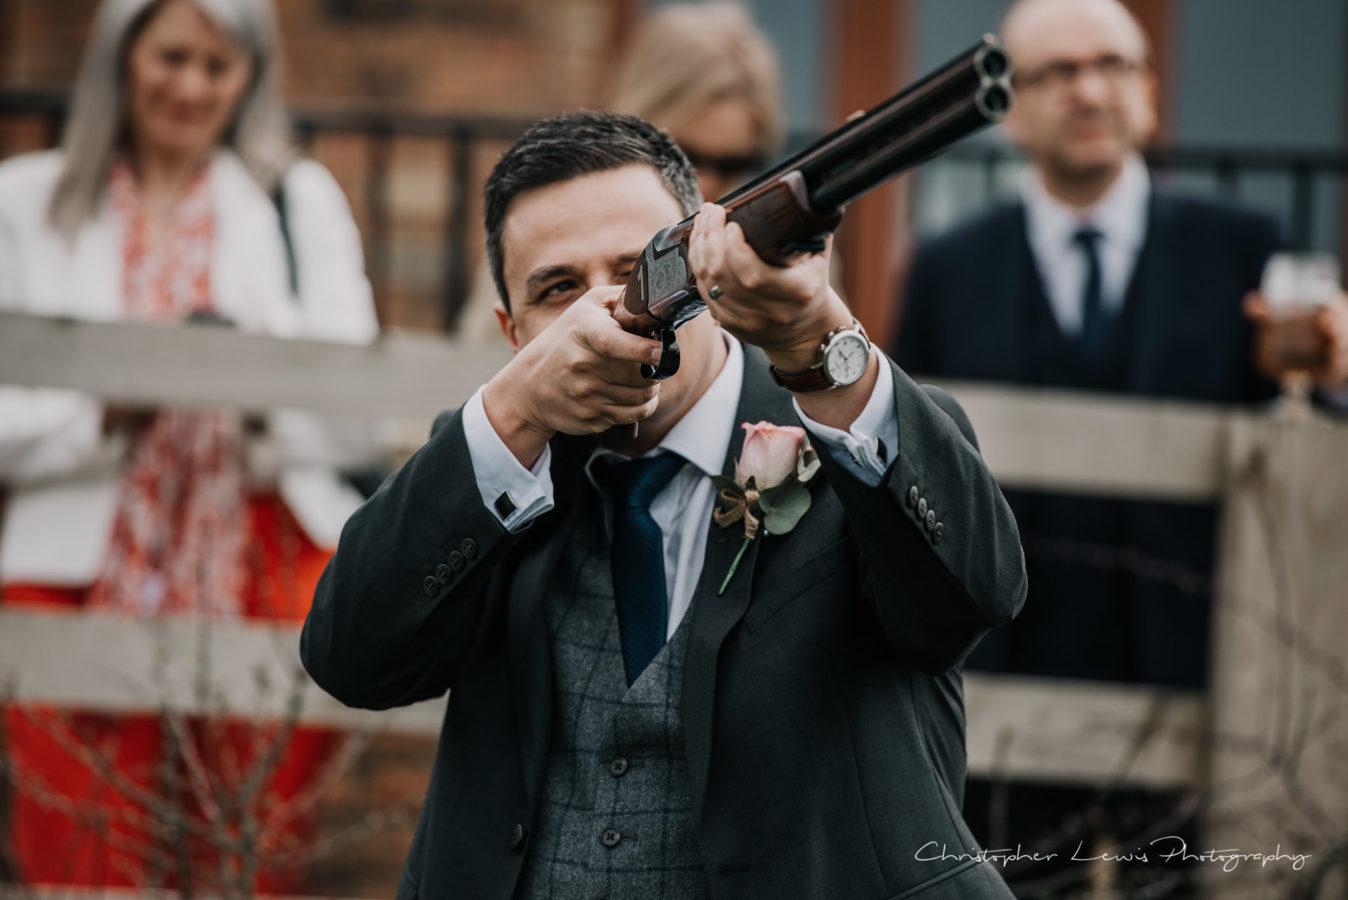 Thief-Hall-Wedding-Christopher-Lewis-Photography-51